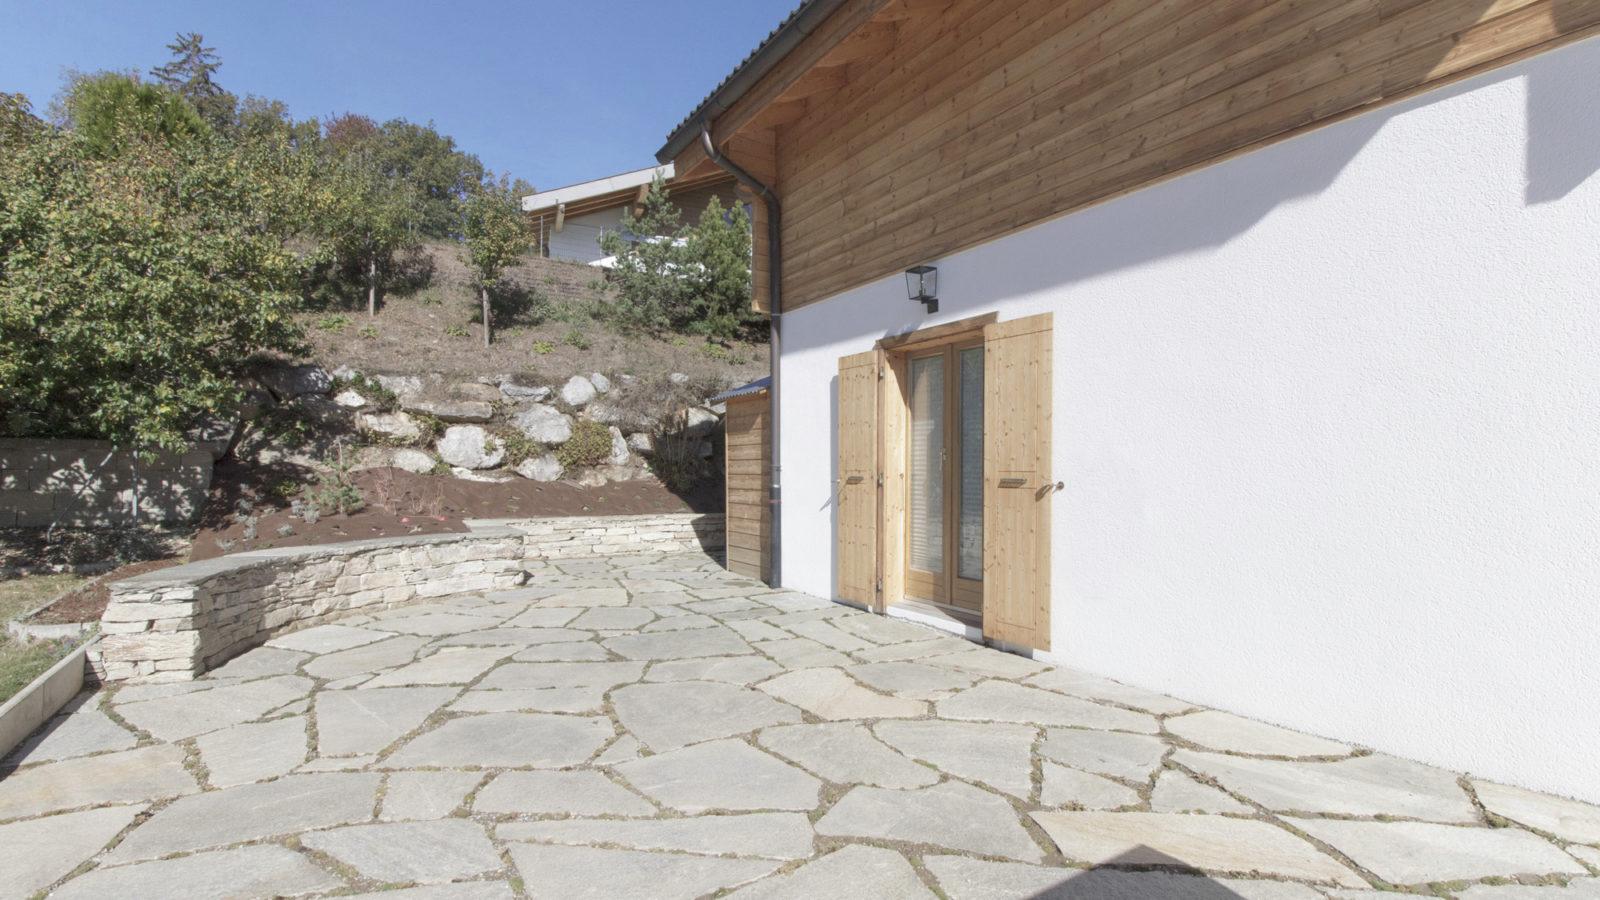 CSDK-Architectes-Chalet-Renovation-Exterieur_08